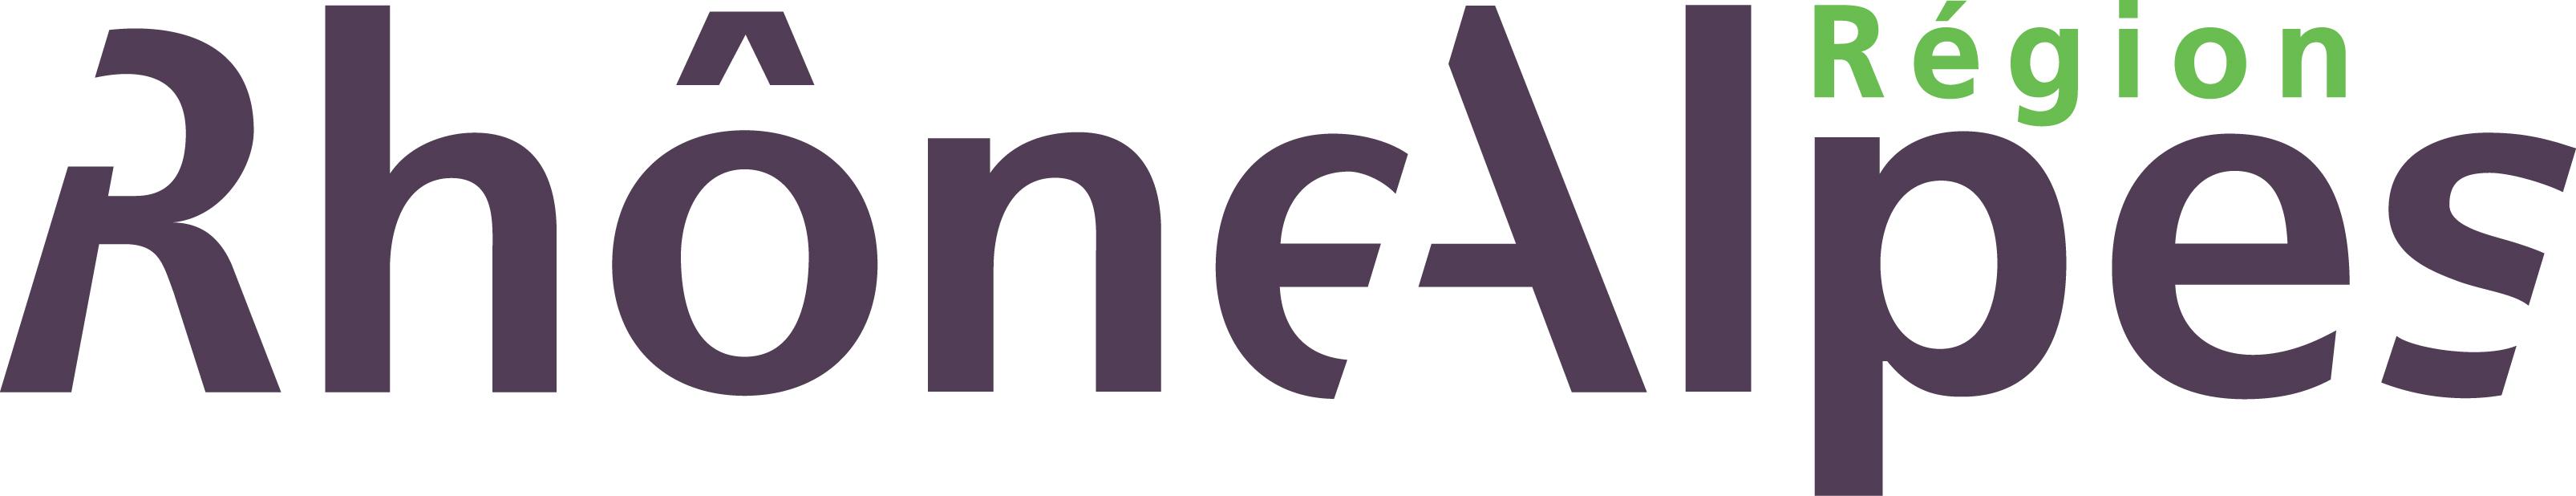 logo-Région-rhône-alpes